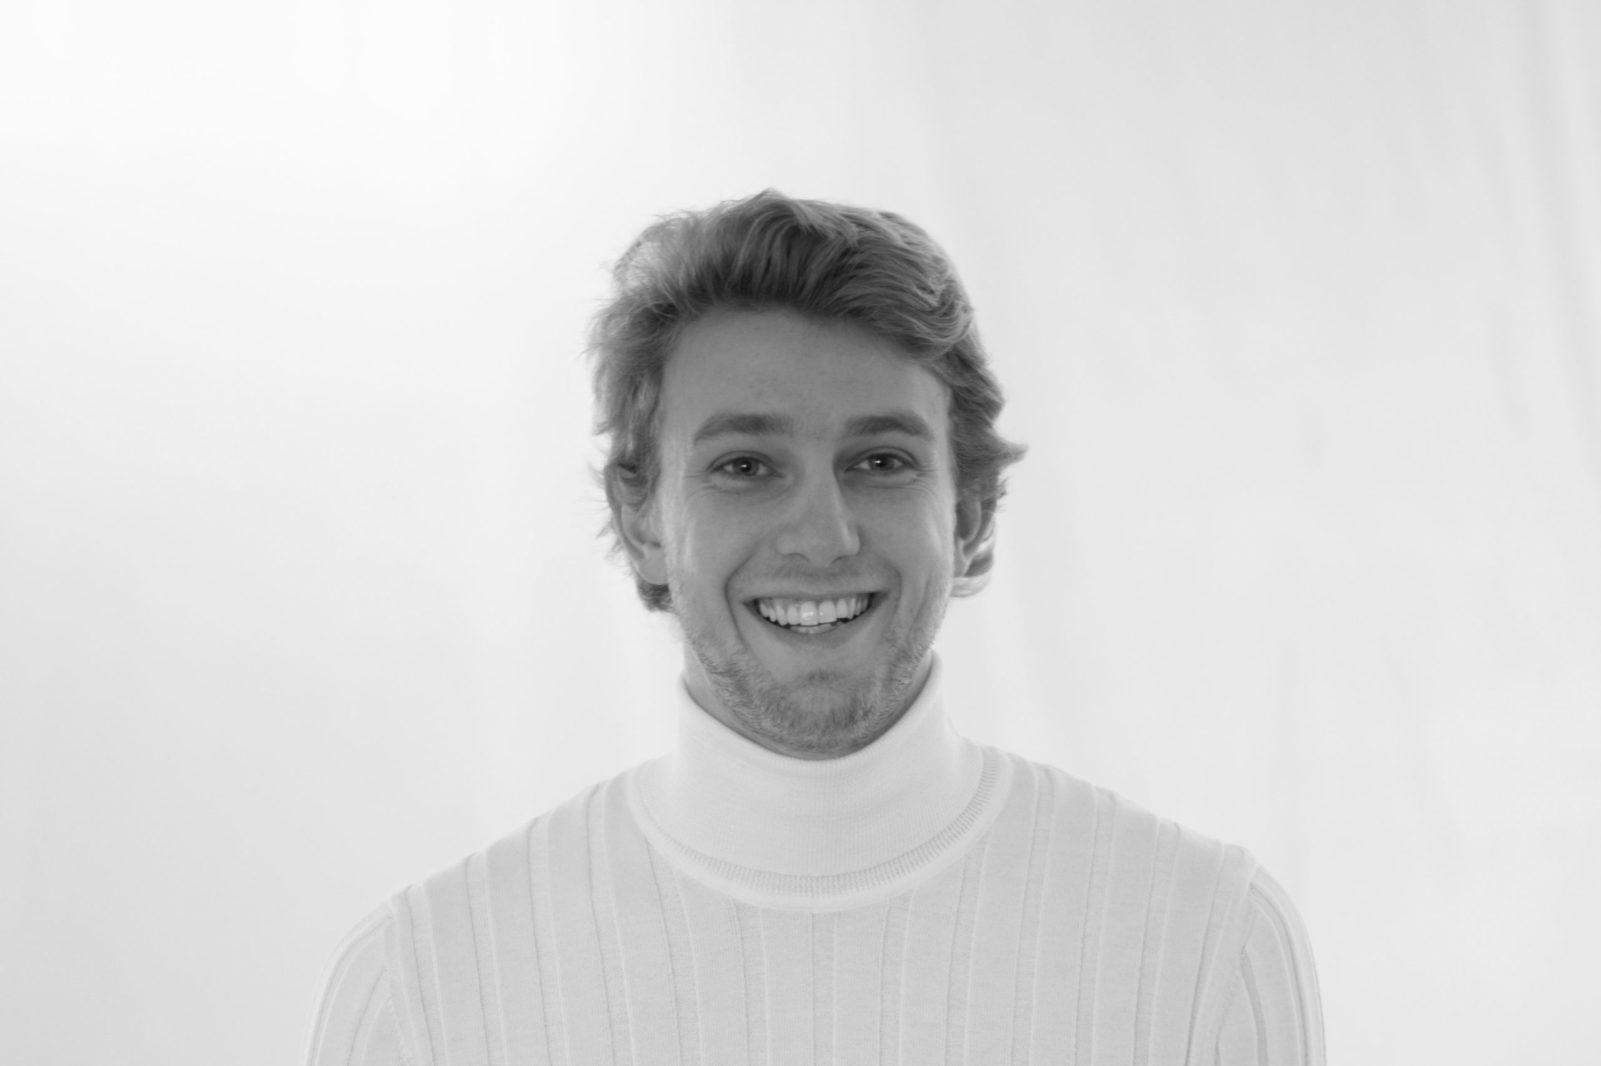 Rasmus Fackler-Stamm